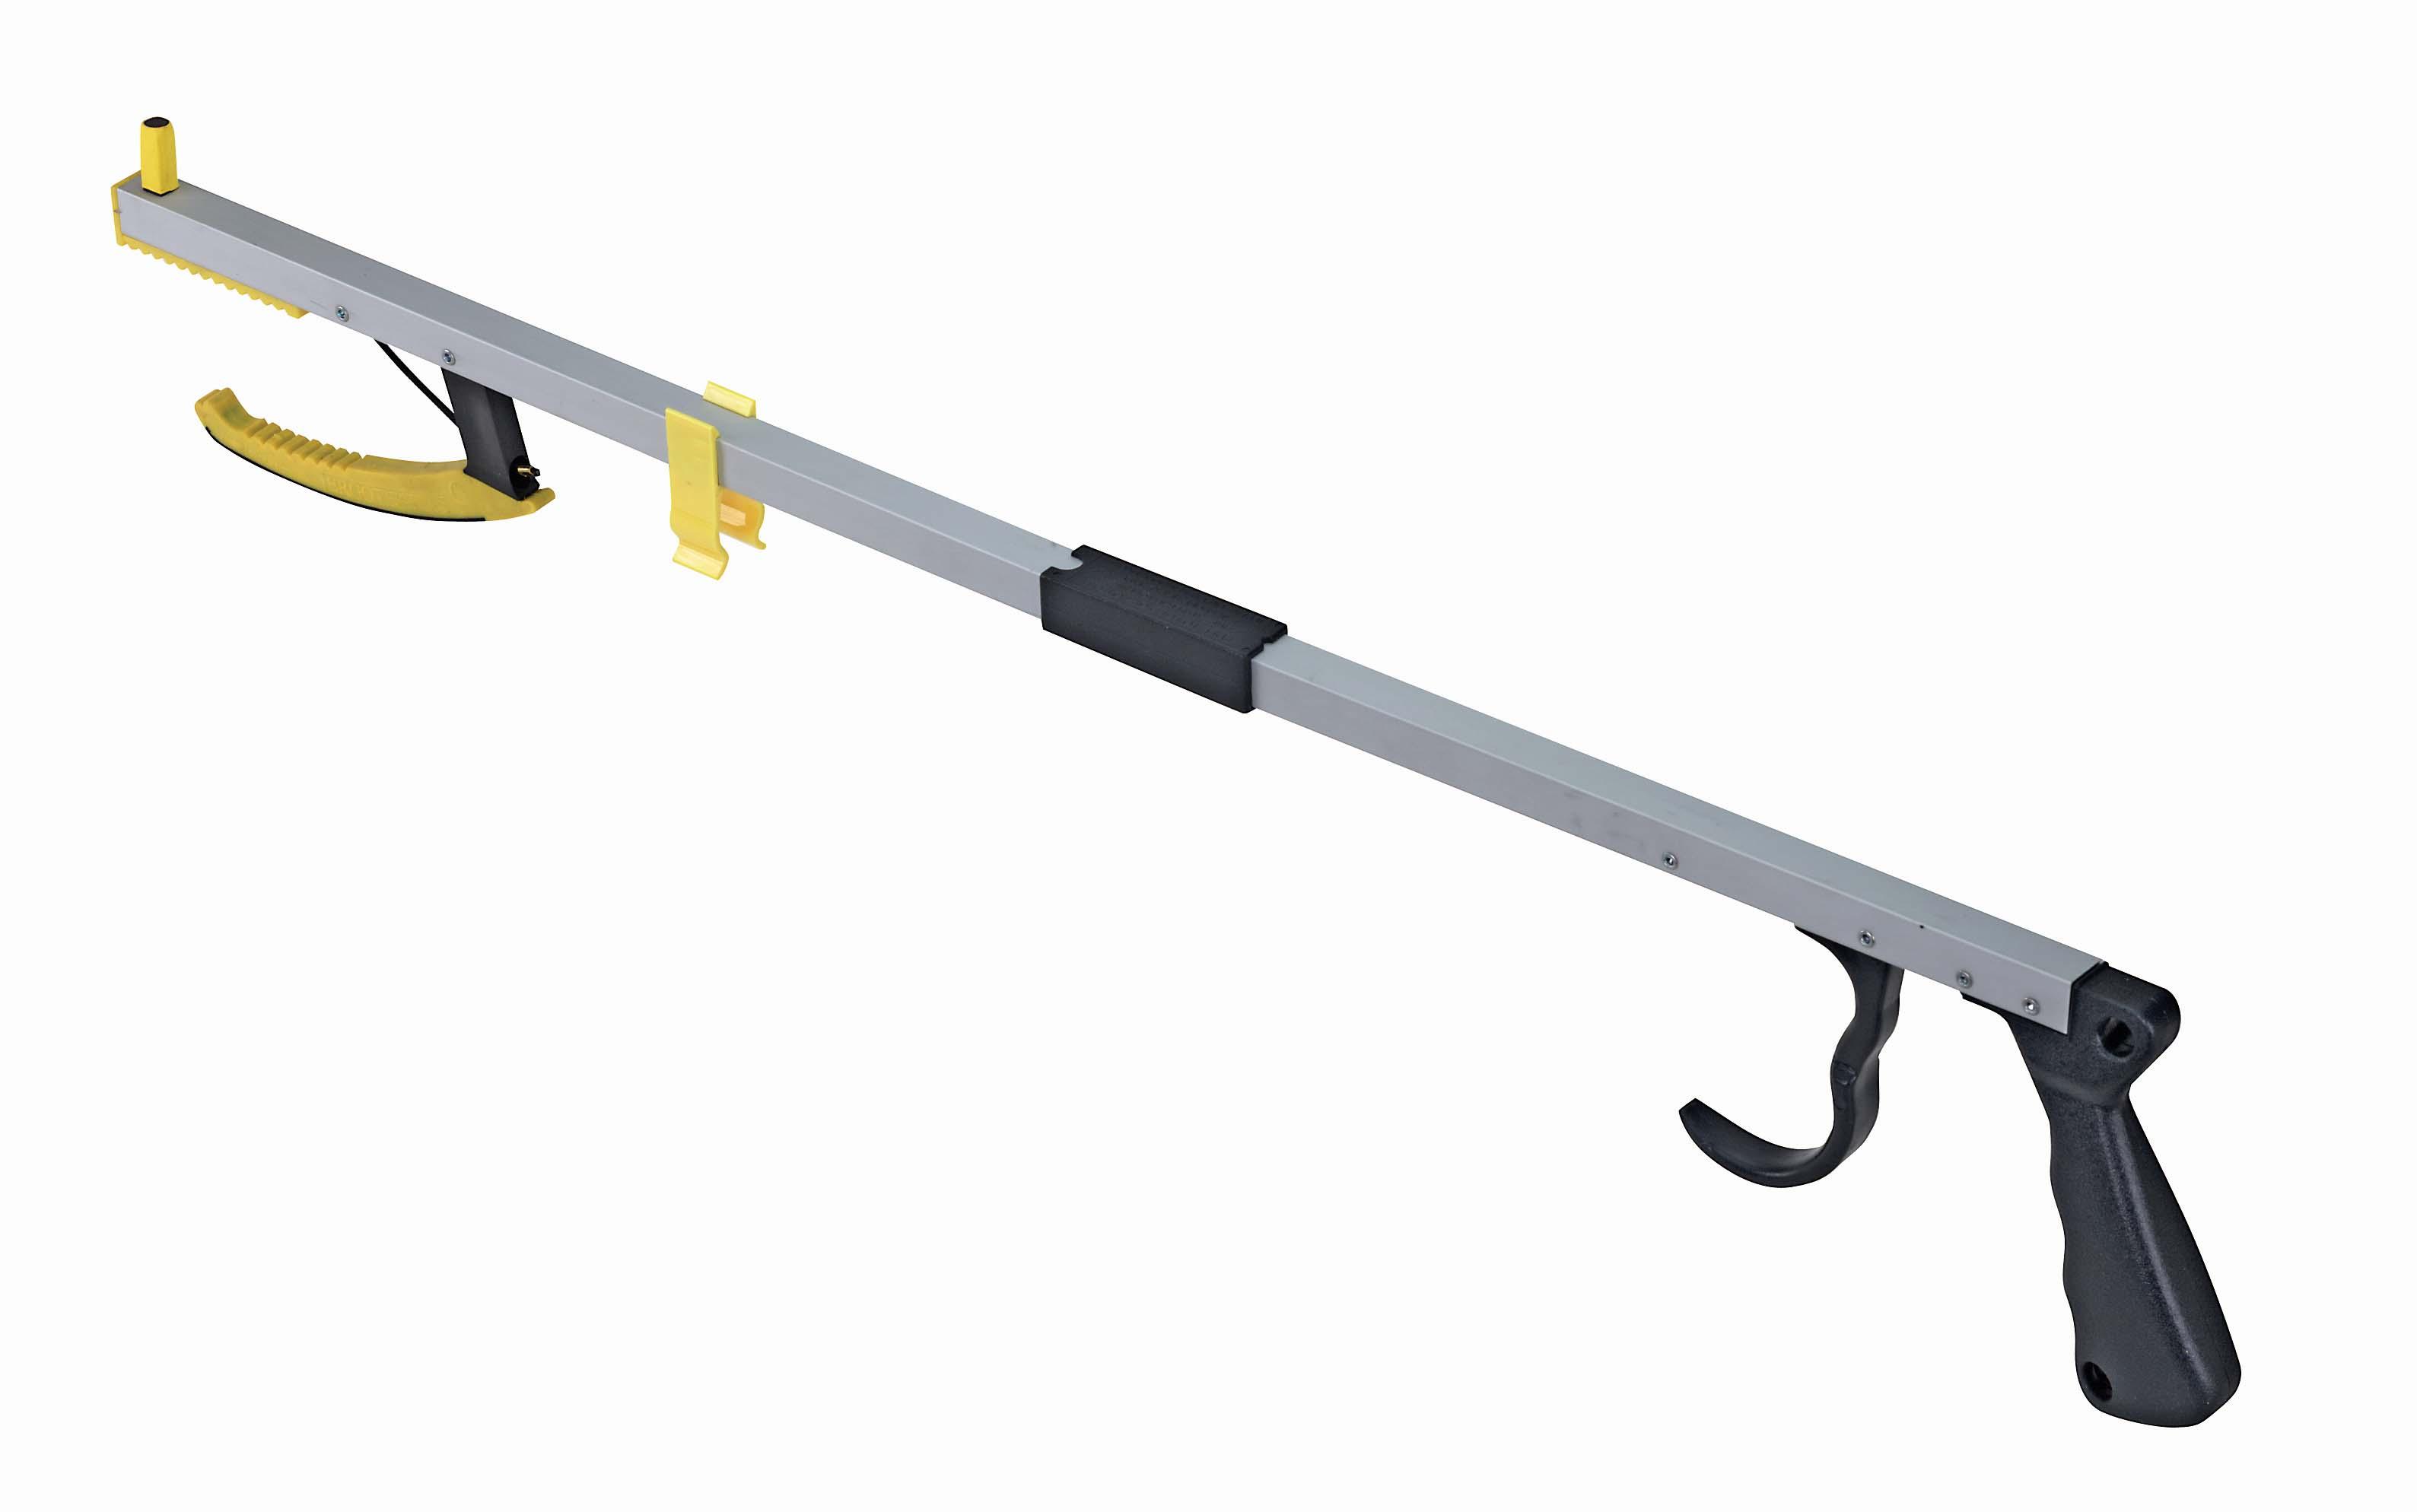 32-duro-tek-plus-reacher-640-1773-0623-lr.jpg